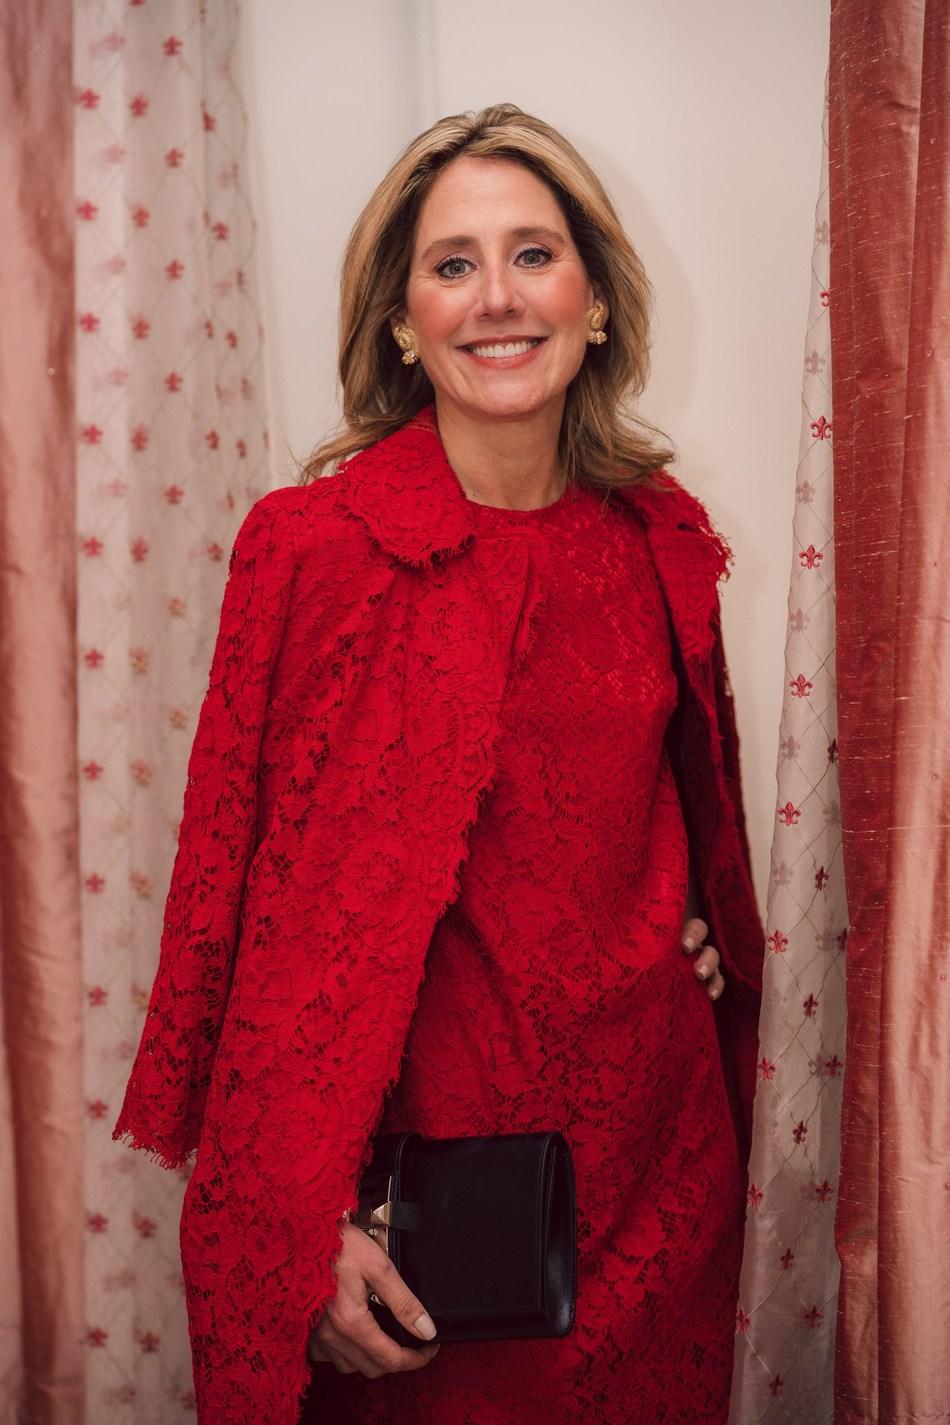 Laurie Ann Goldman, Chief Executive Officer, New Avon LLC